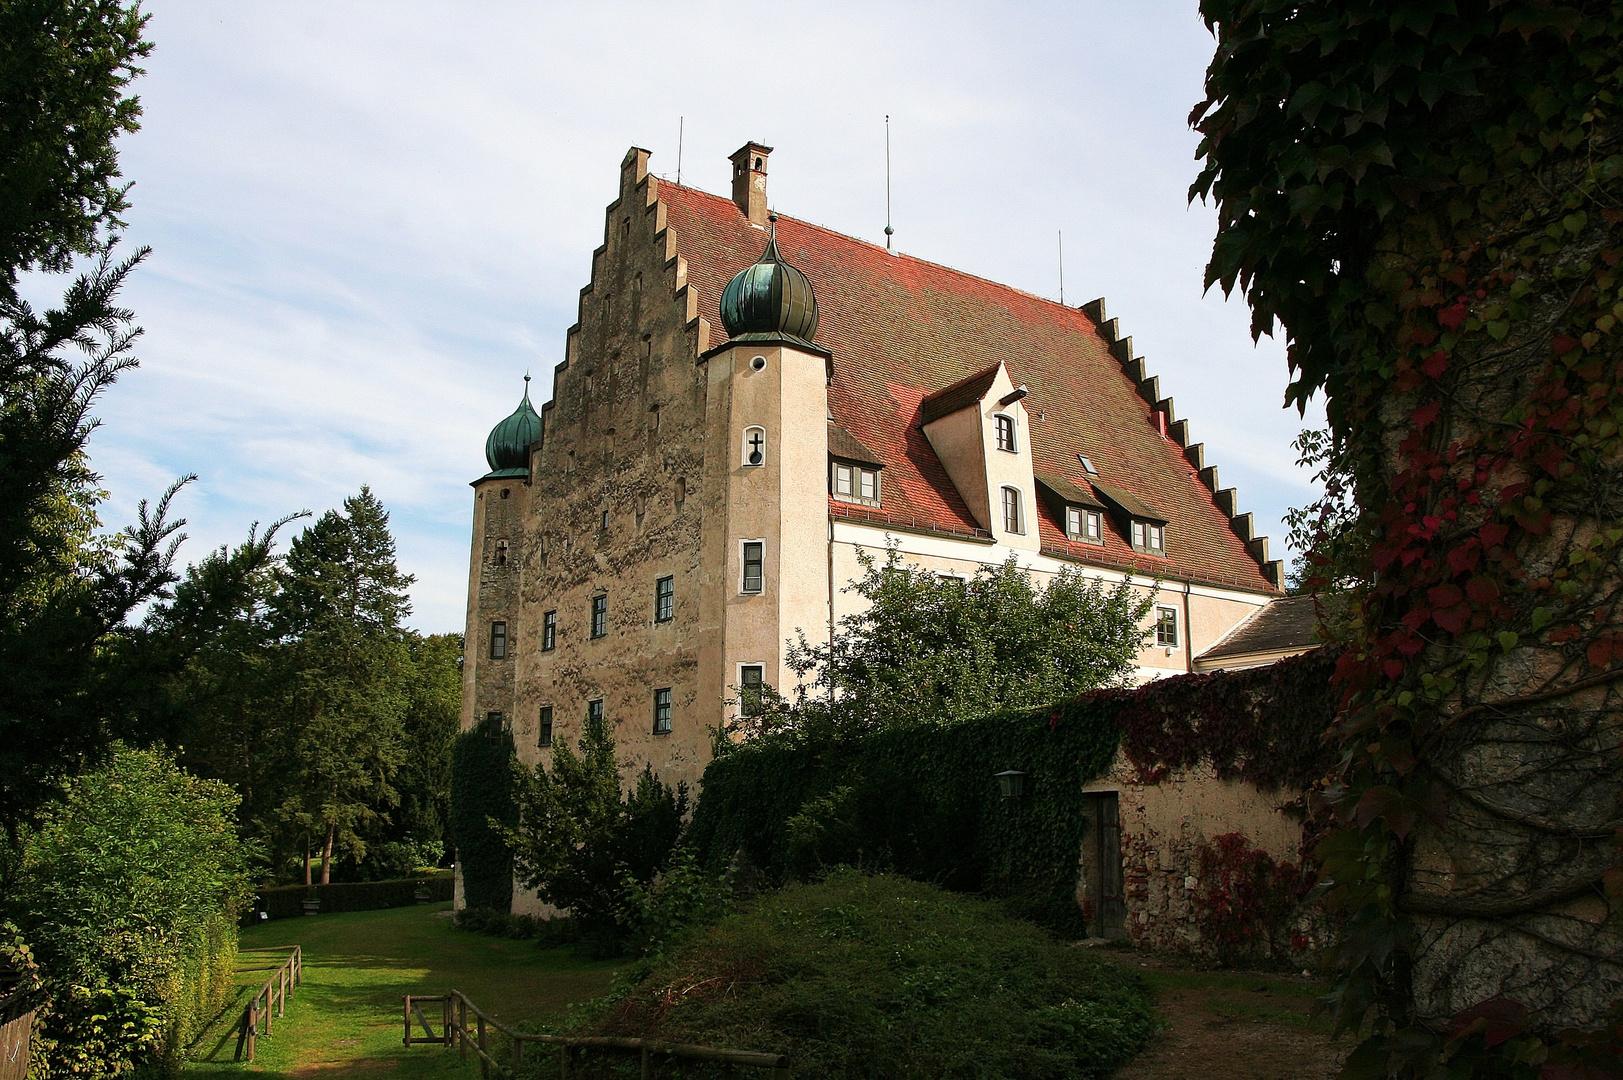 Schloß Eggersberg im Altmühltal